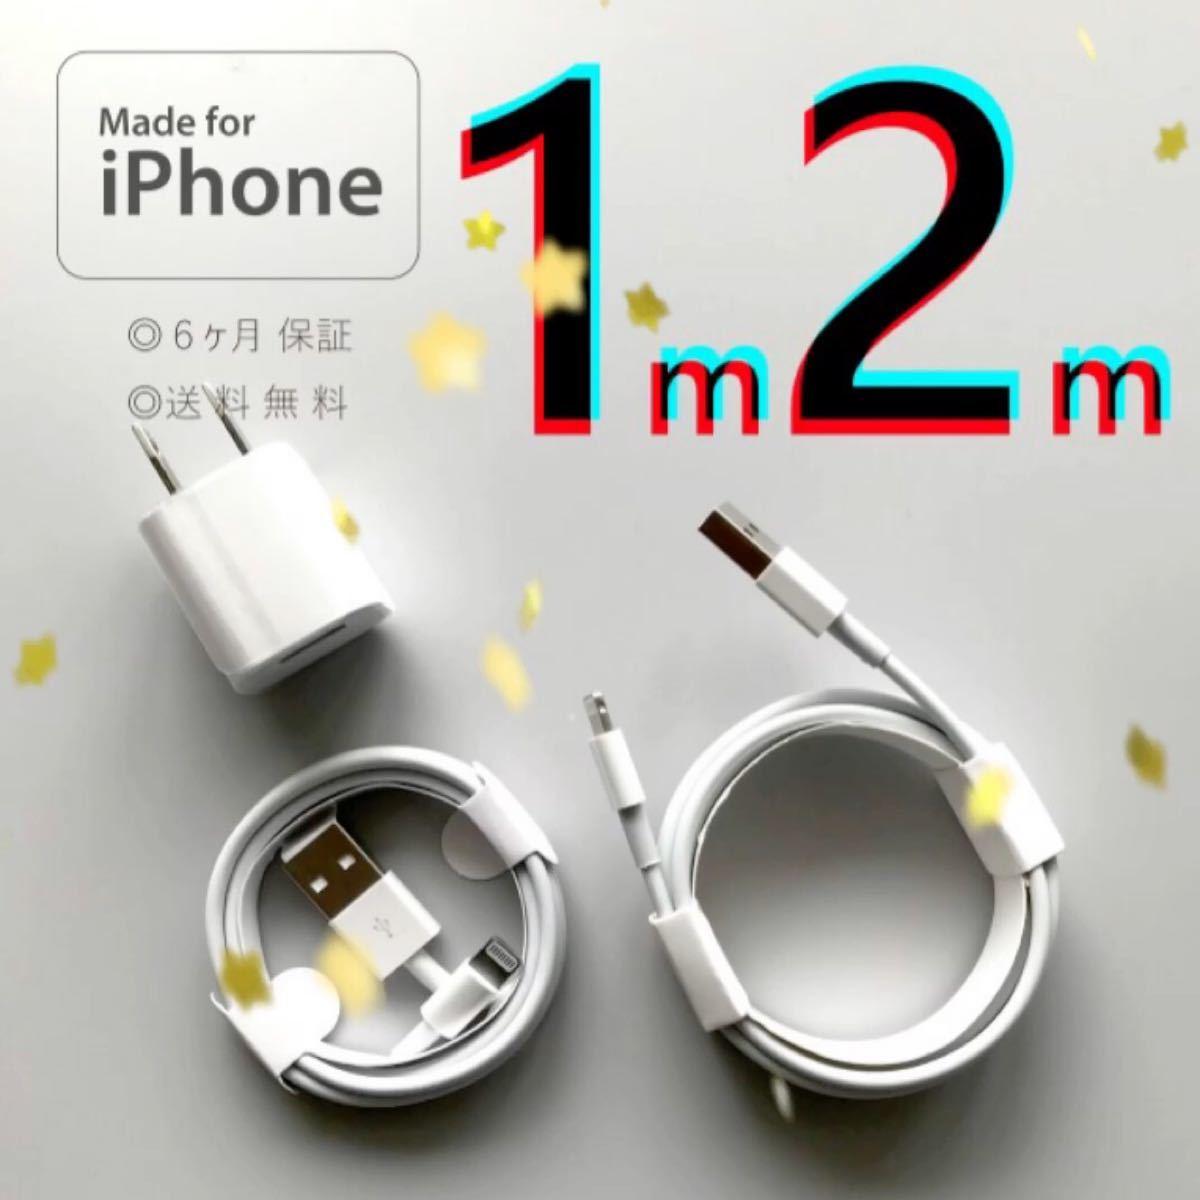 iPhone 充電器 lightning cable ライトニングケーブル(高速充電 急速充電) USB スマホ 電源 コード